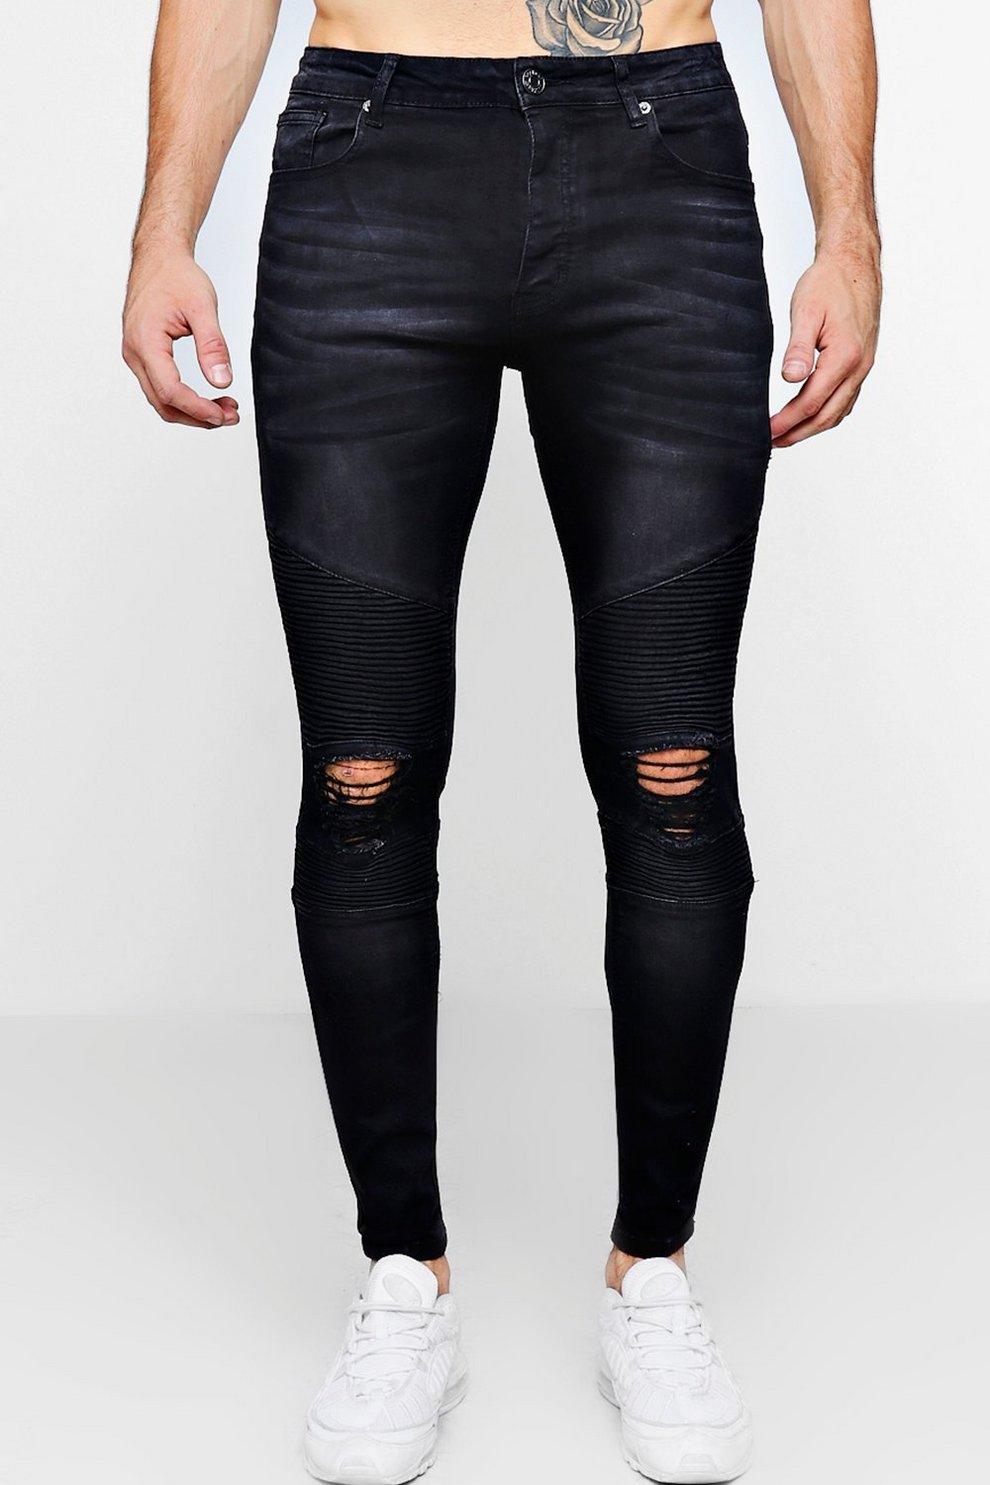 0f340c2f91 Mens Washed Black Biker Detail Skinny Fit Jeans. Hover to zoom